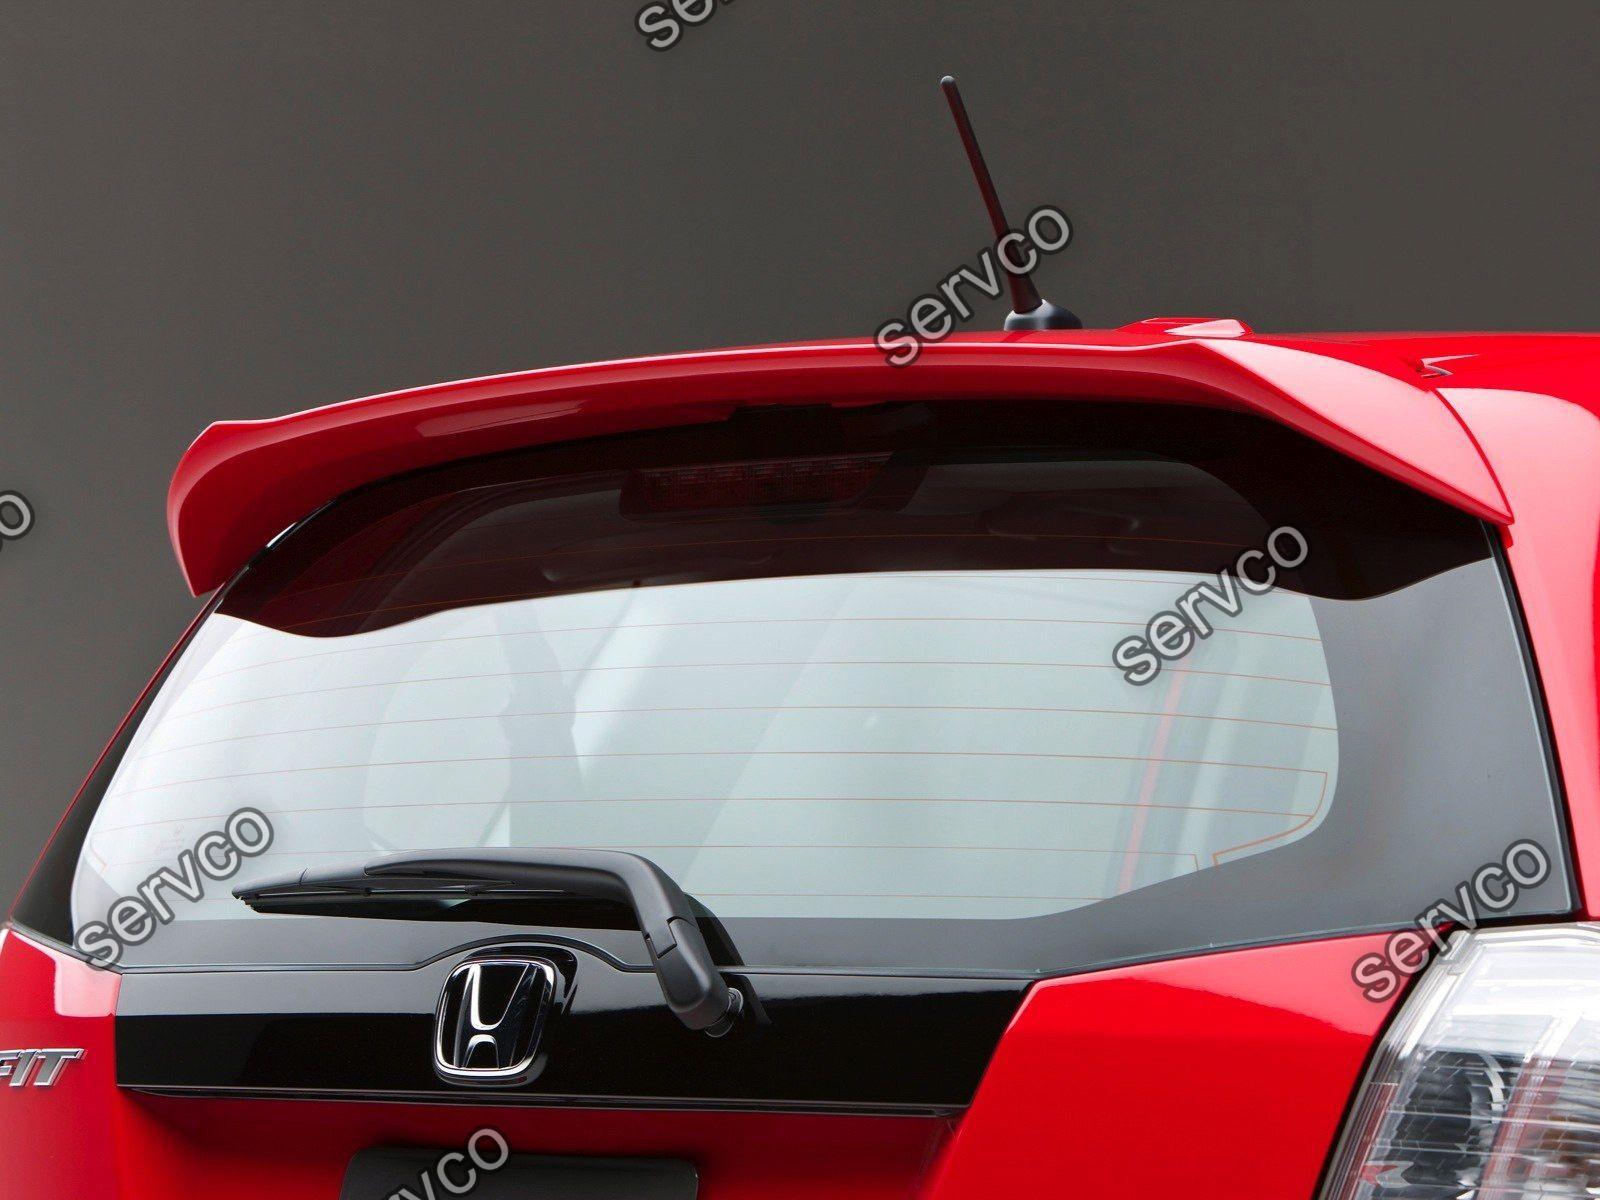 Eleron spoiler tuning sport Honda Jazz Mk2 GE8 Mugen Vti Gti Type R S 2008-2014 v1